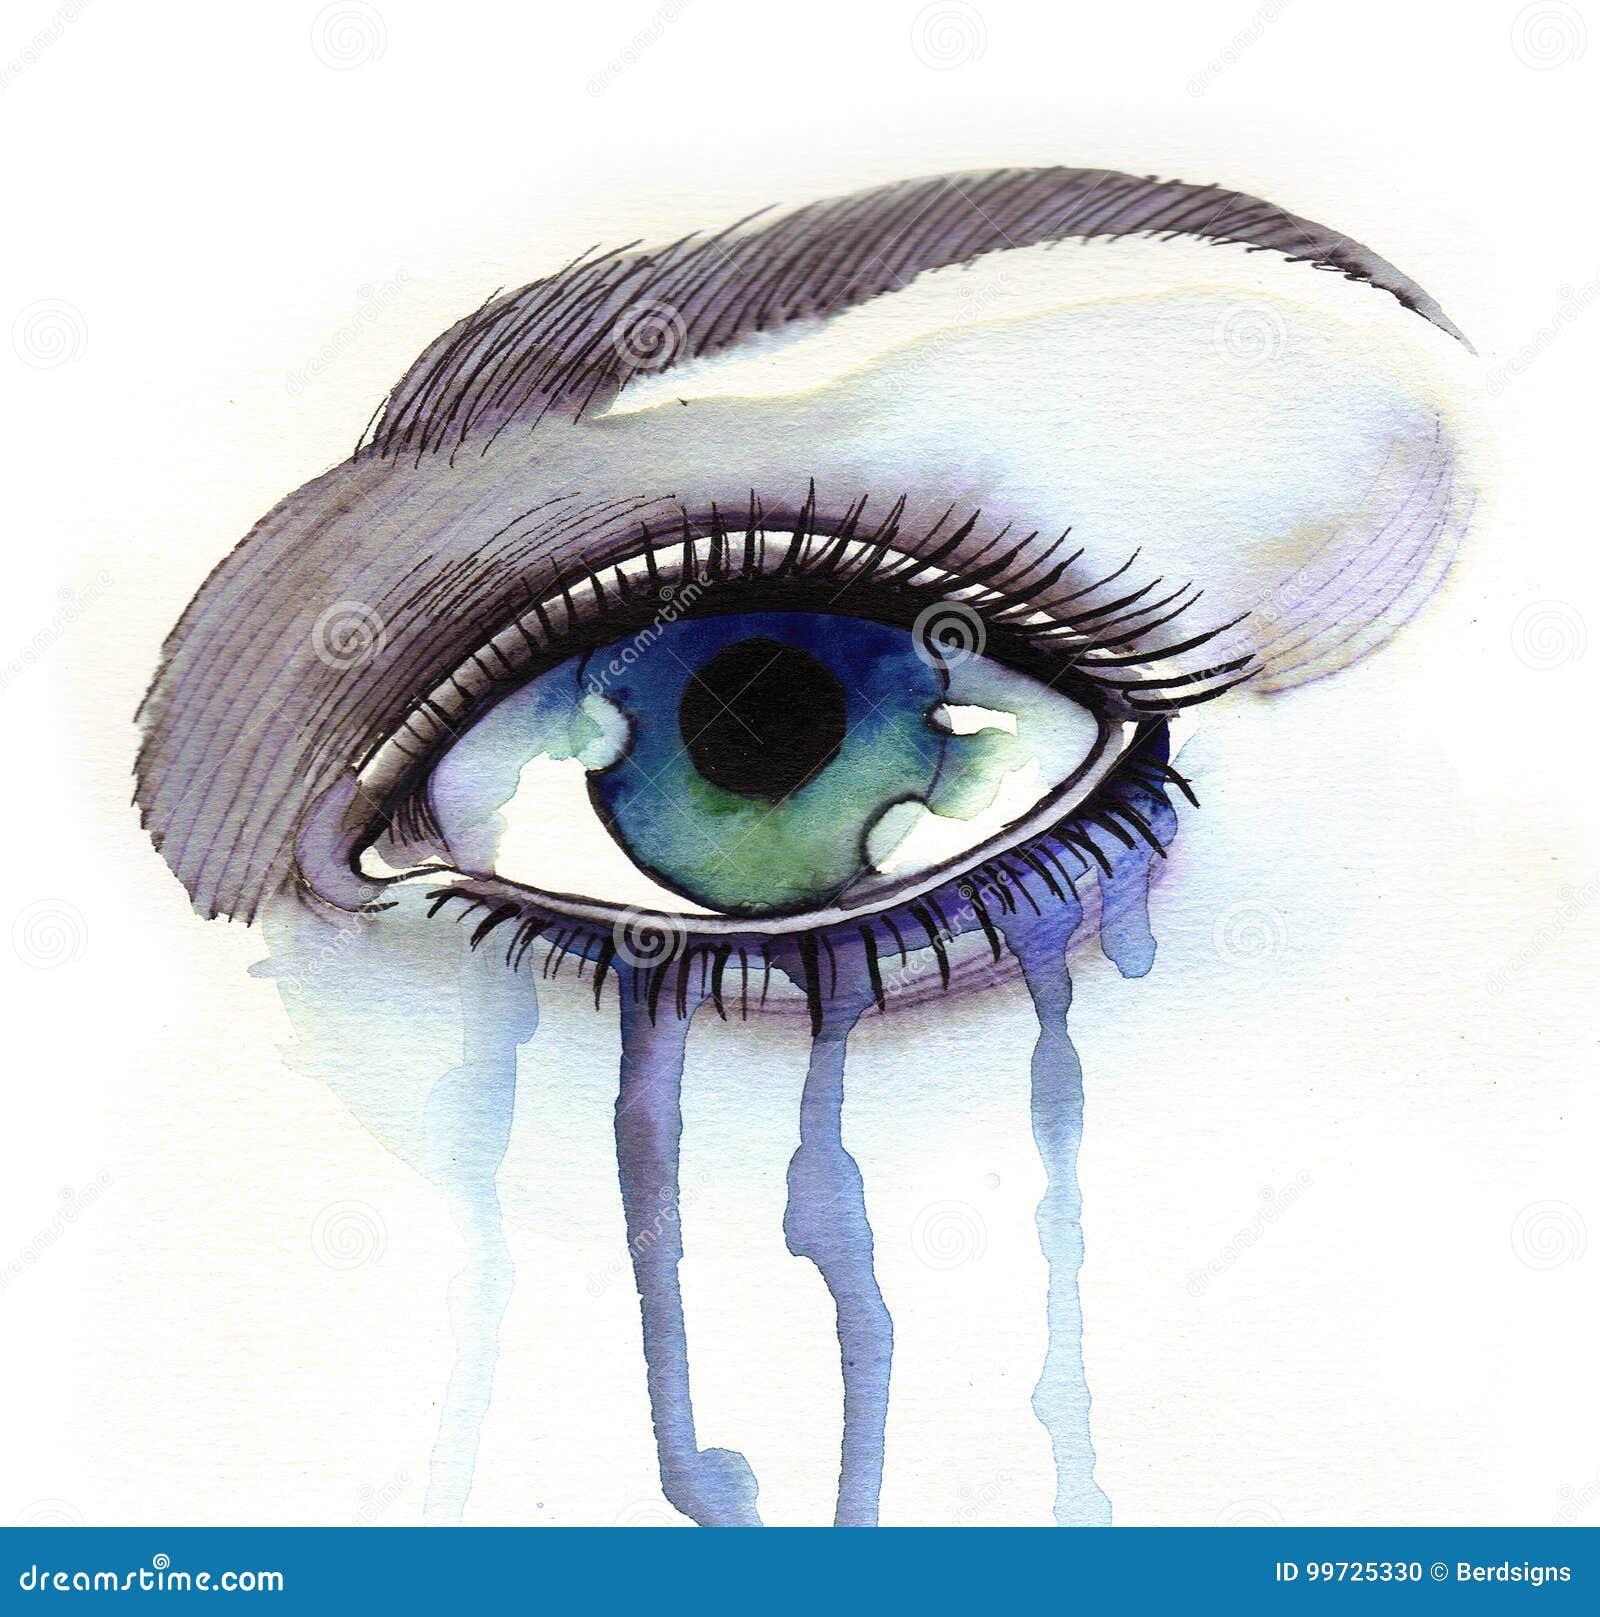 Watercolor sketch of a beautiful crying eye